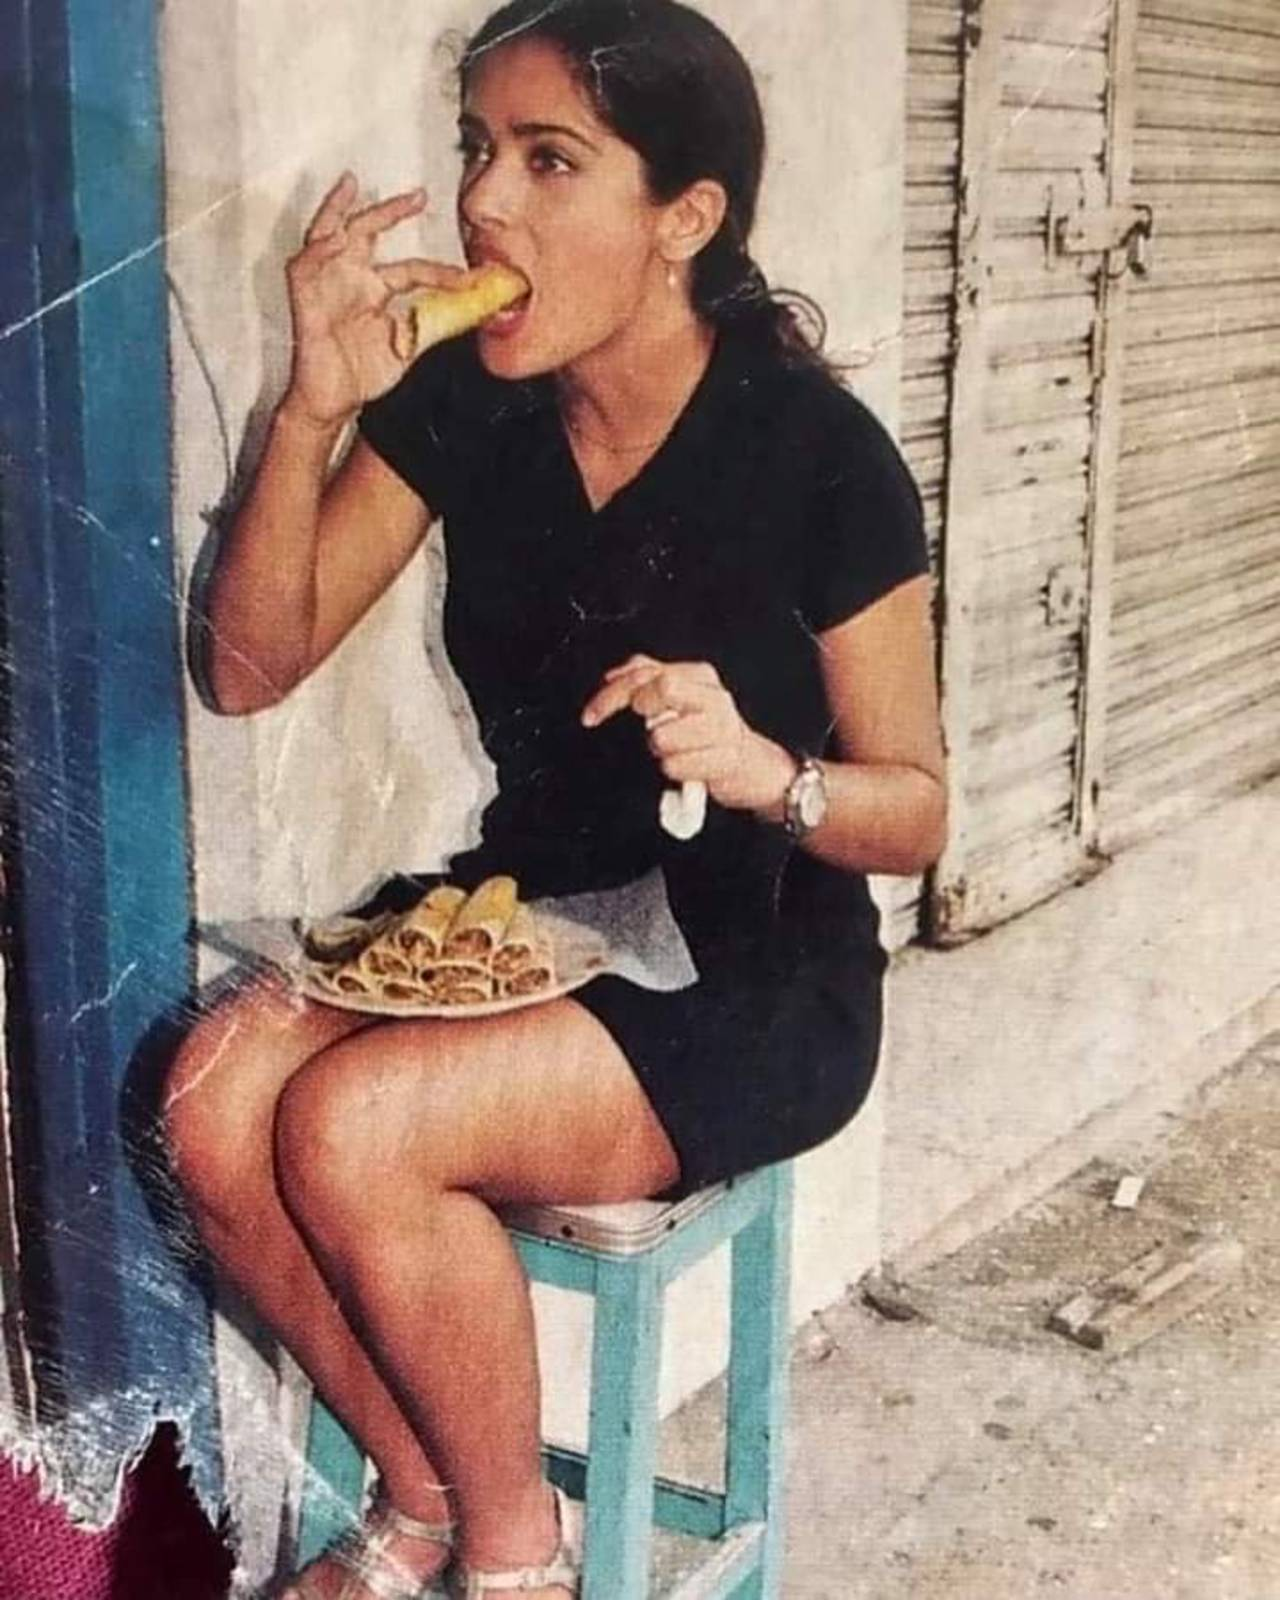 Salma Hayek comiendo tacos foto inédita